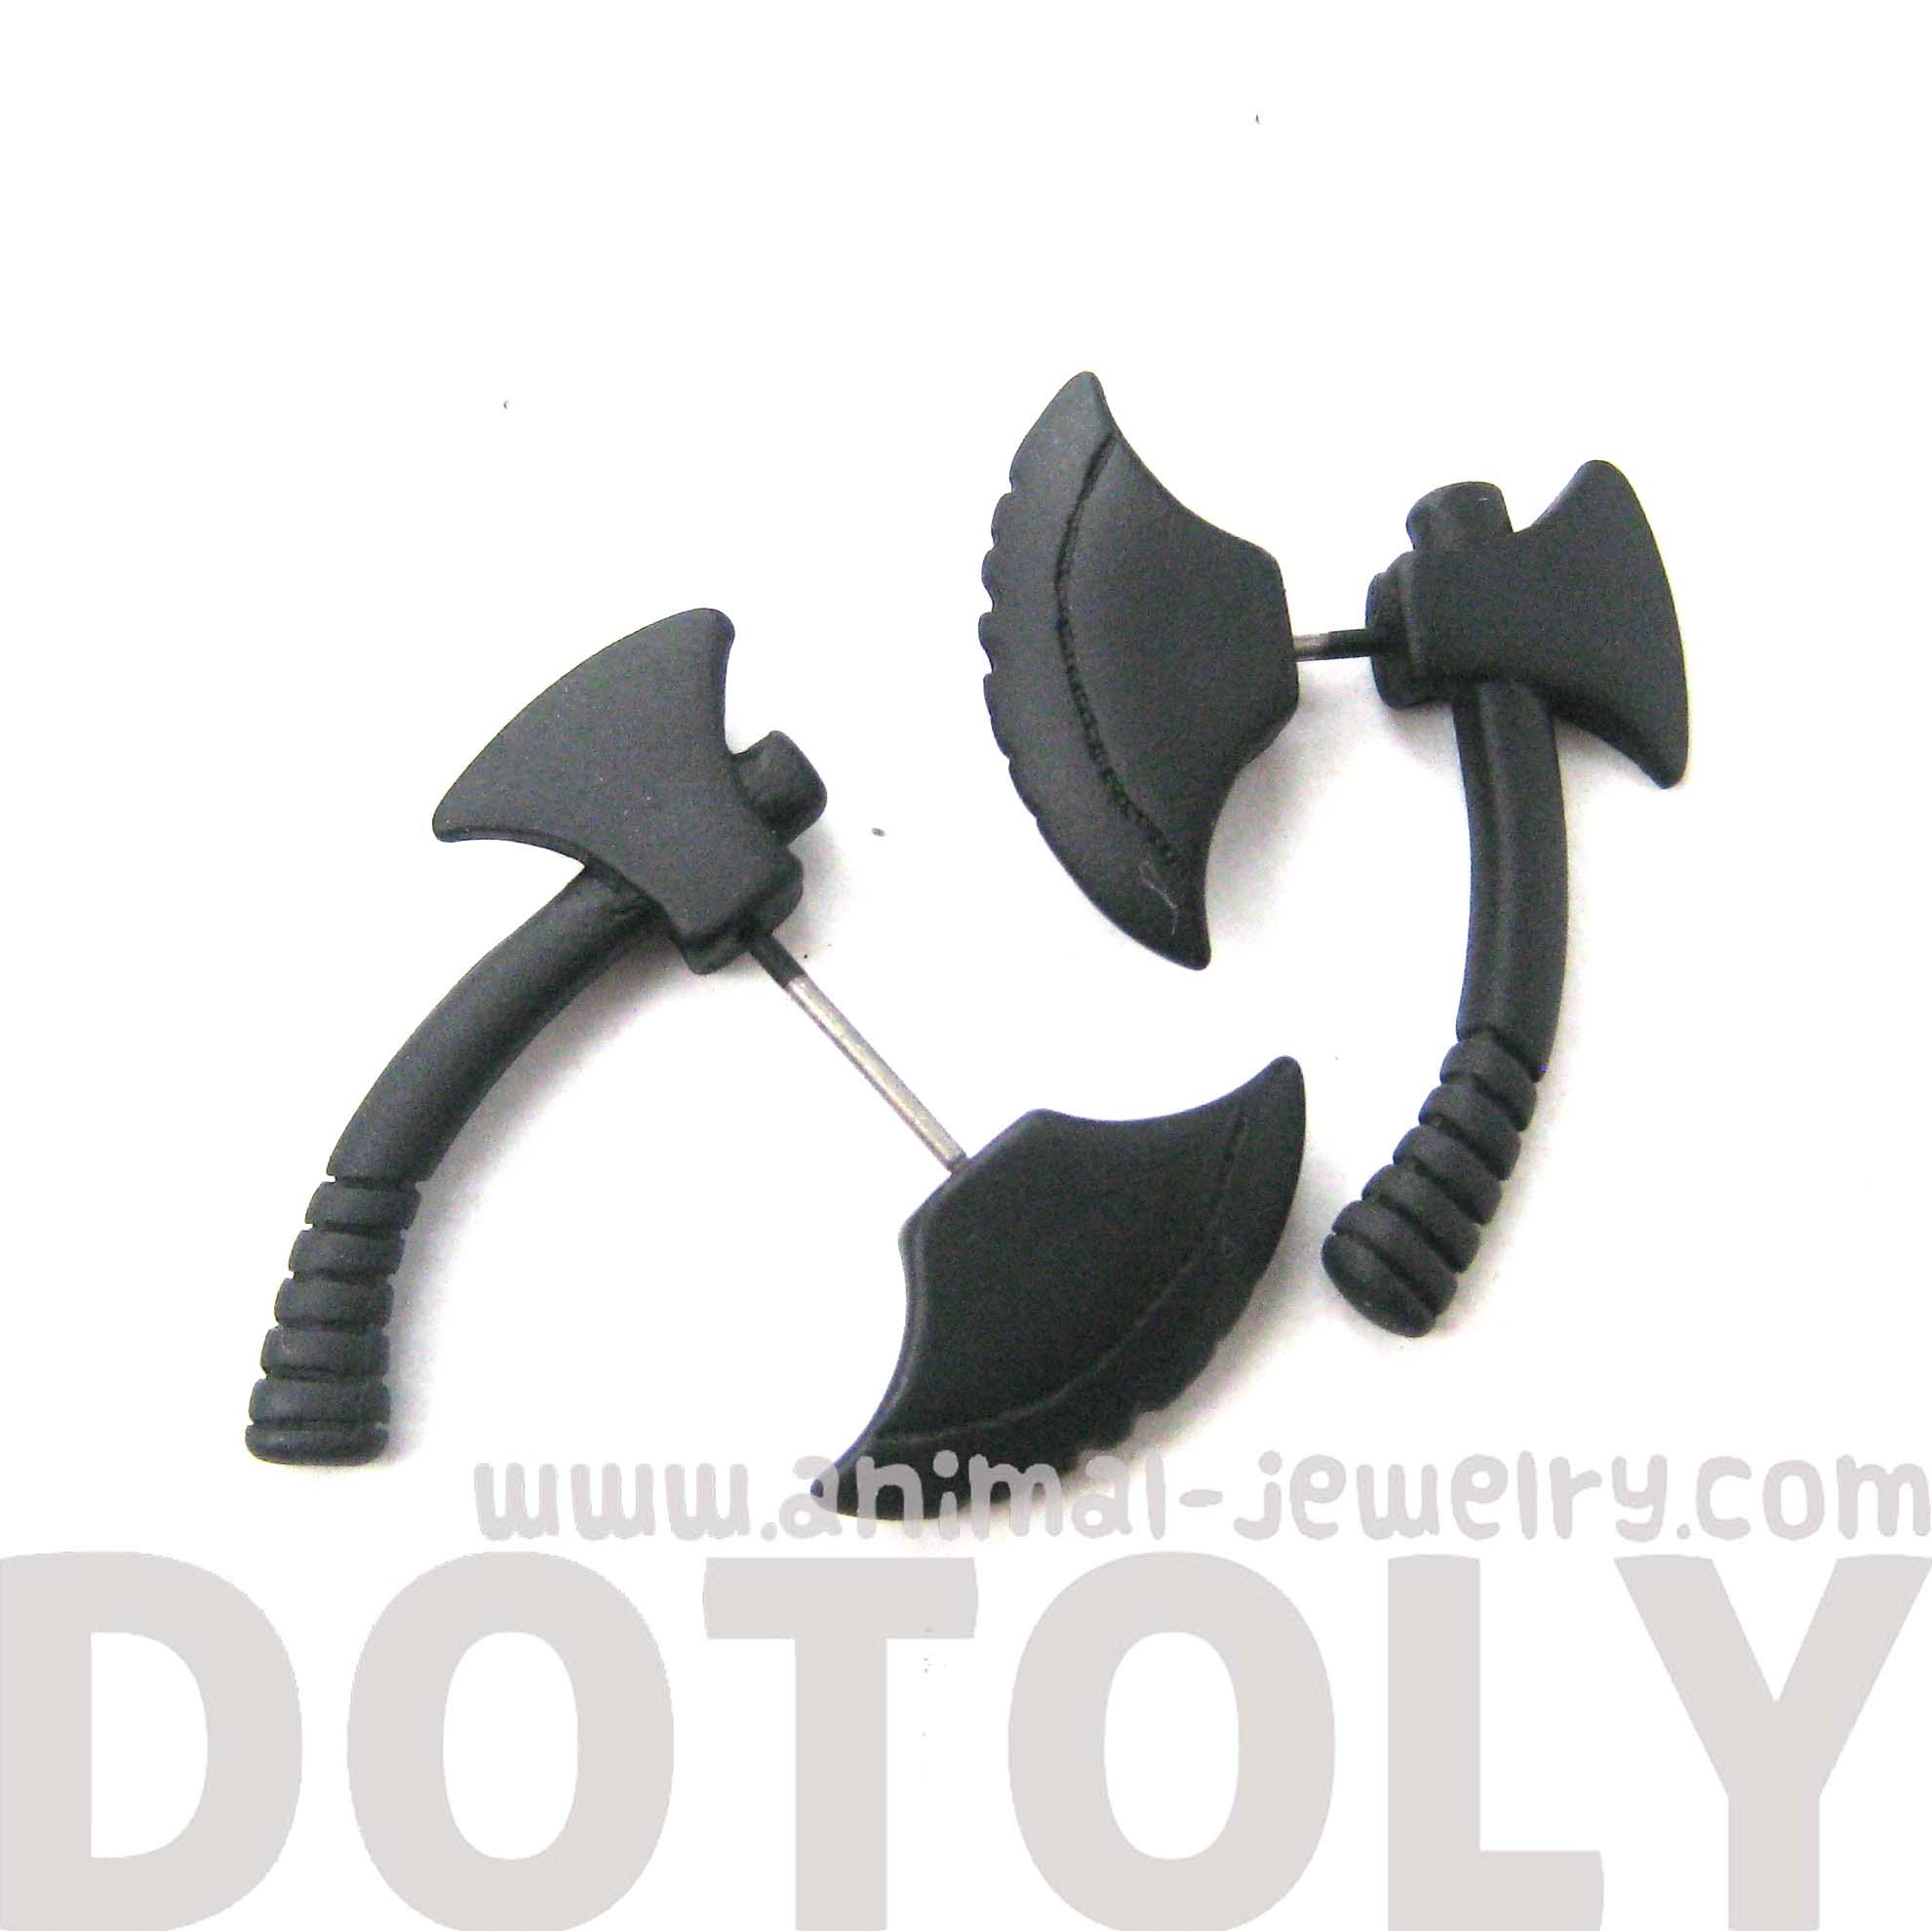 3d Axe Shaped Unisex Fake Gauge Plug Stud Earrings In Black  Thumbnail  3